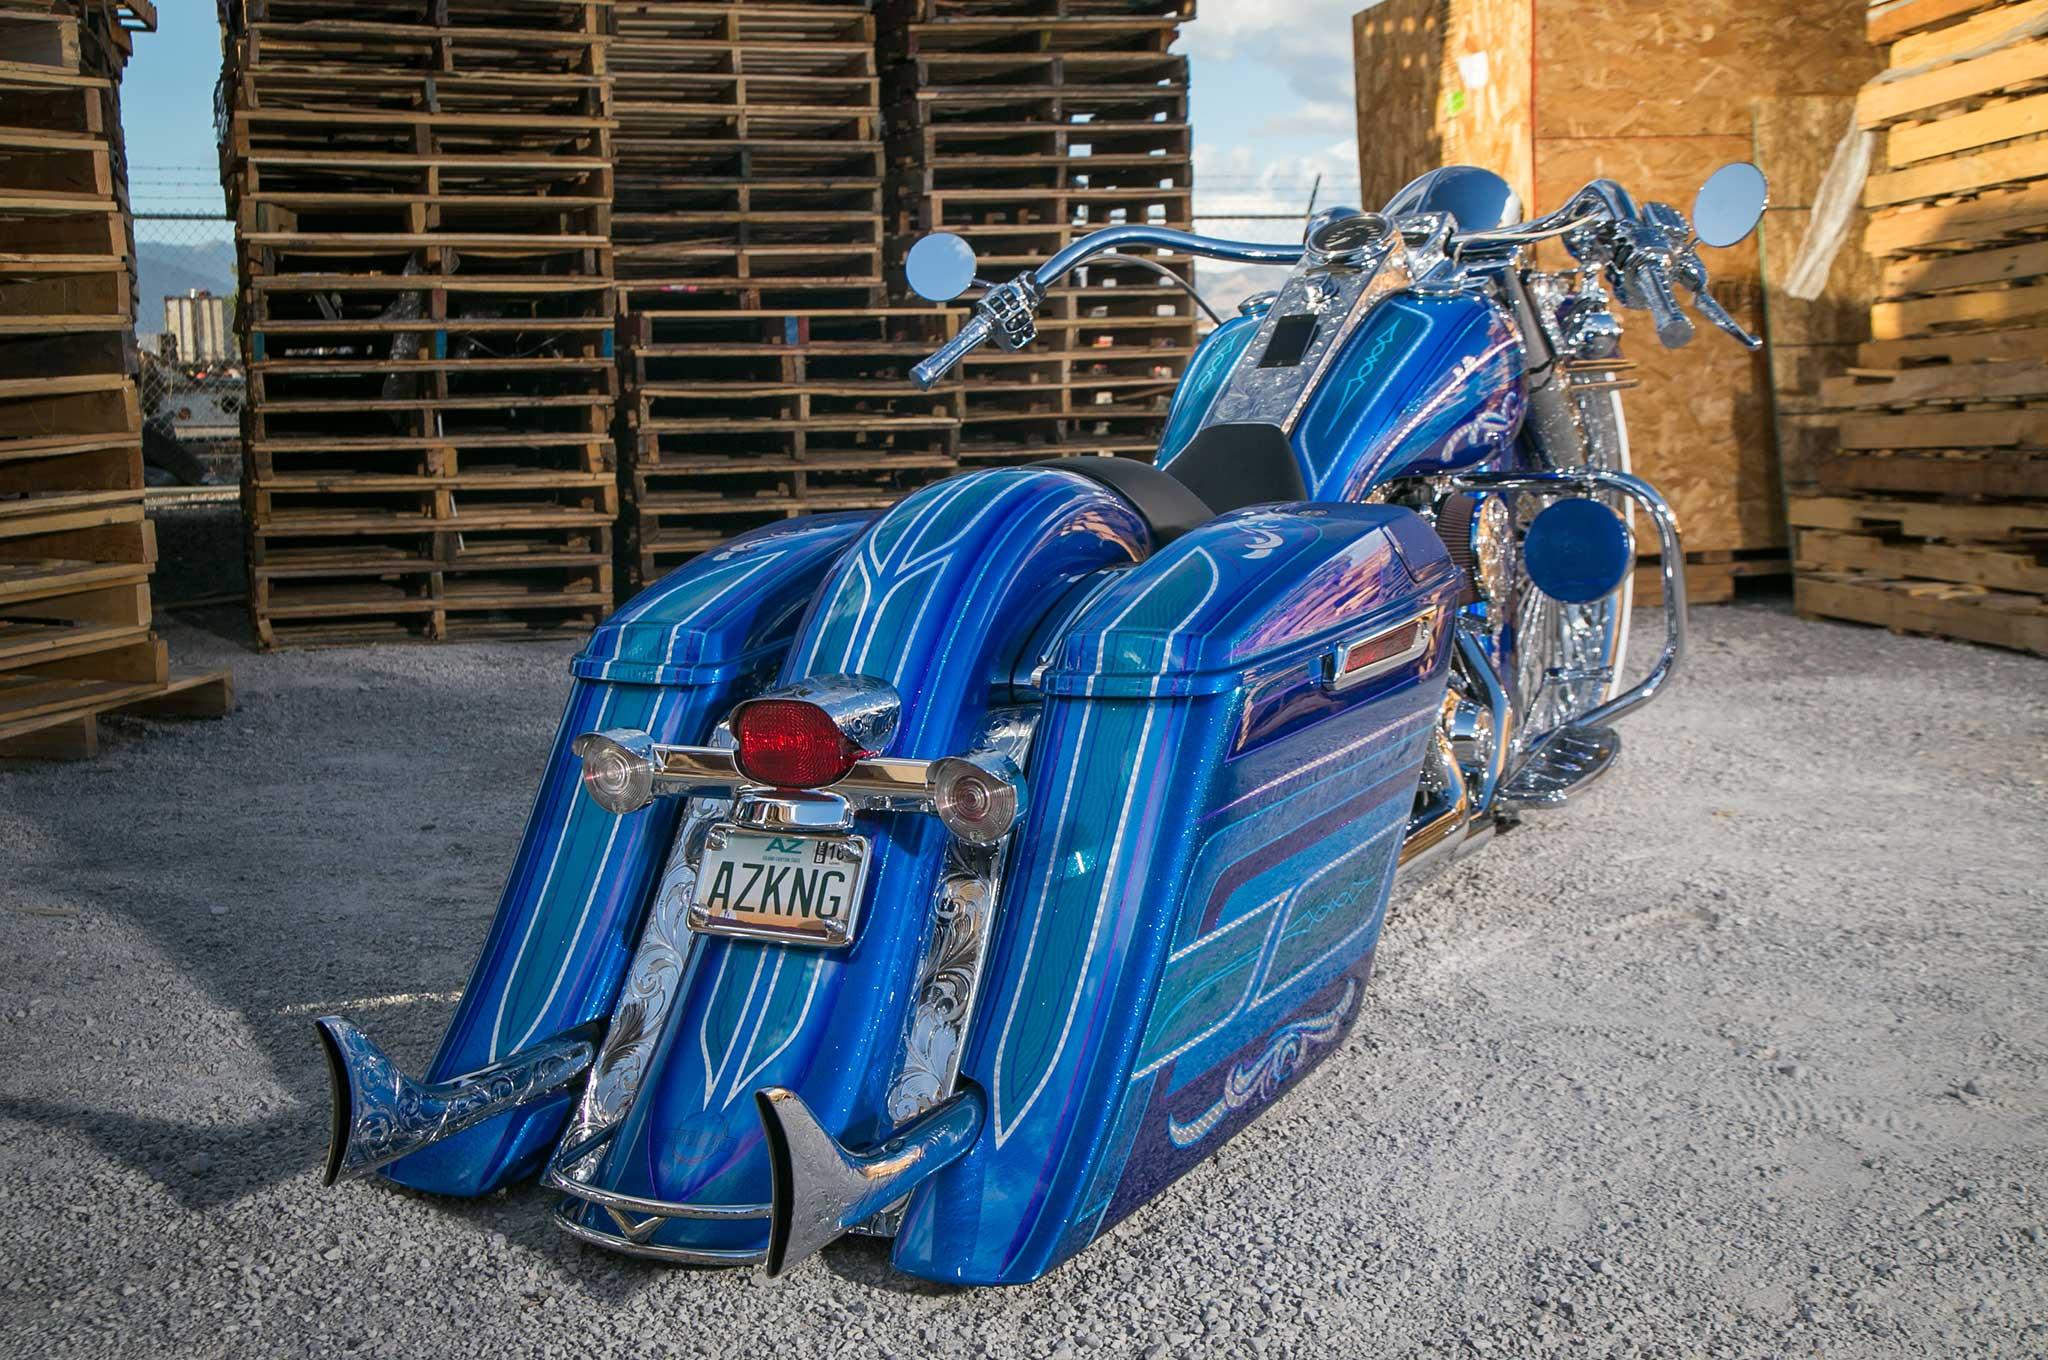 2014 Harley-Davidson Road King - Show Winner